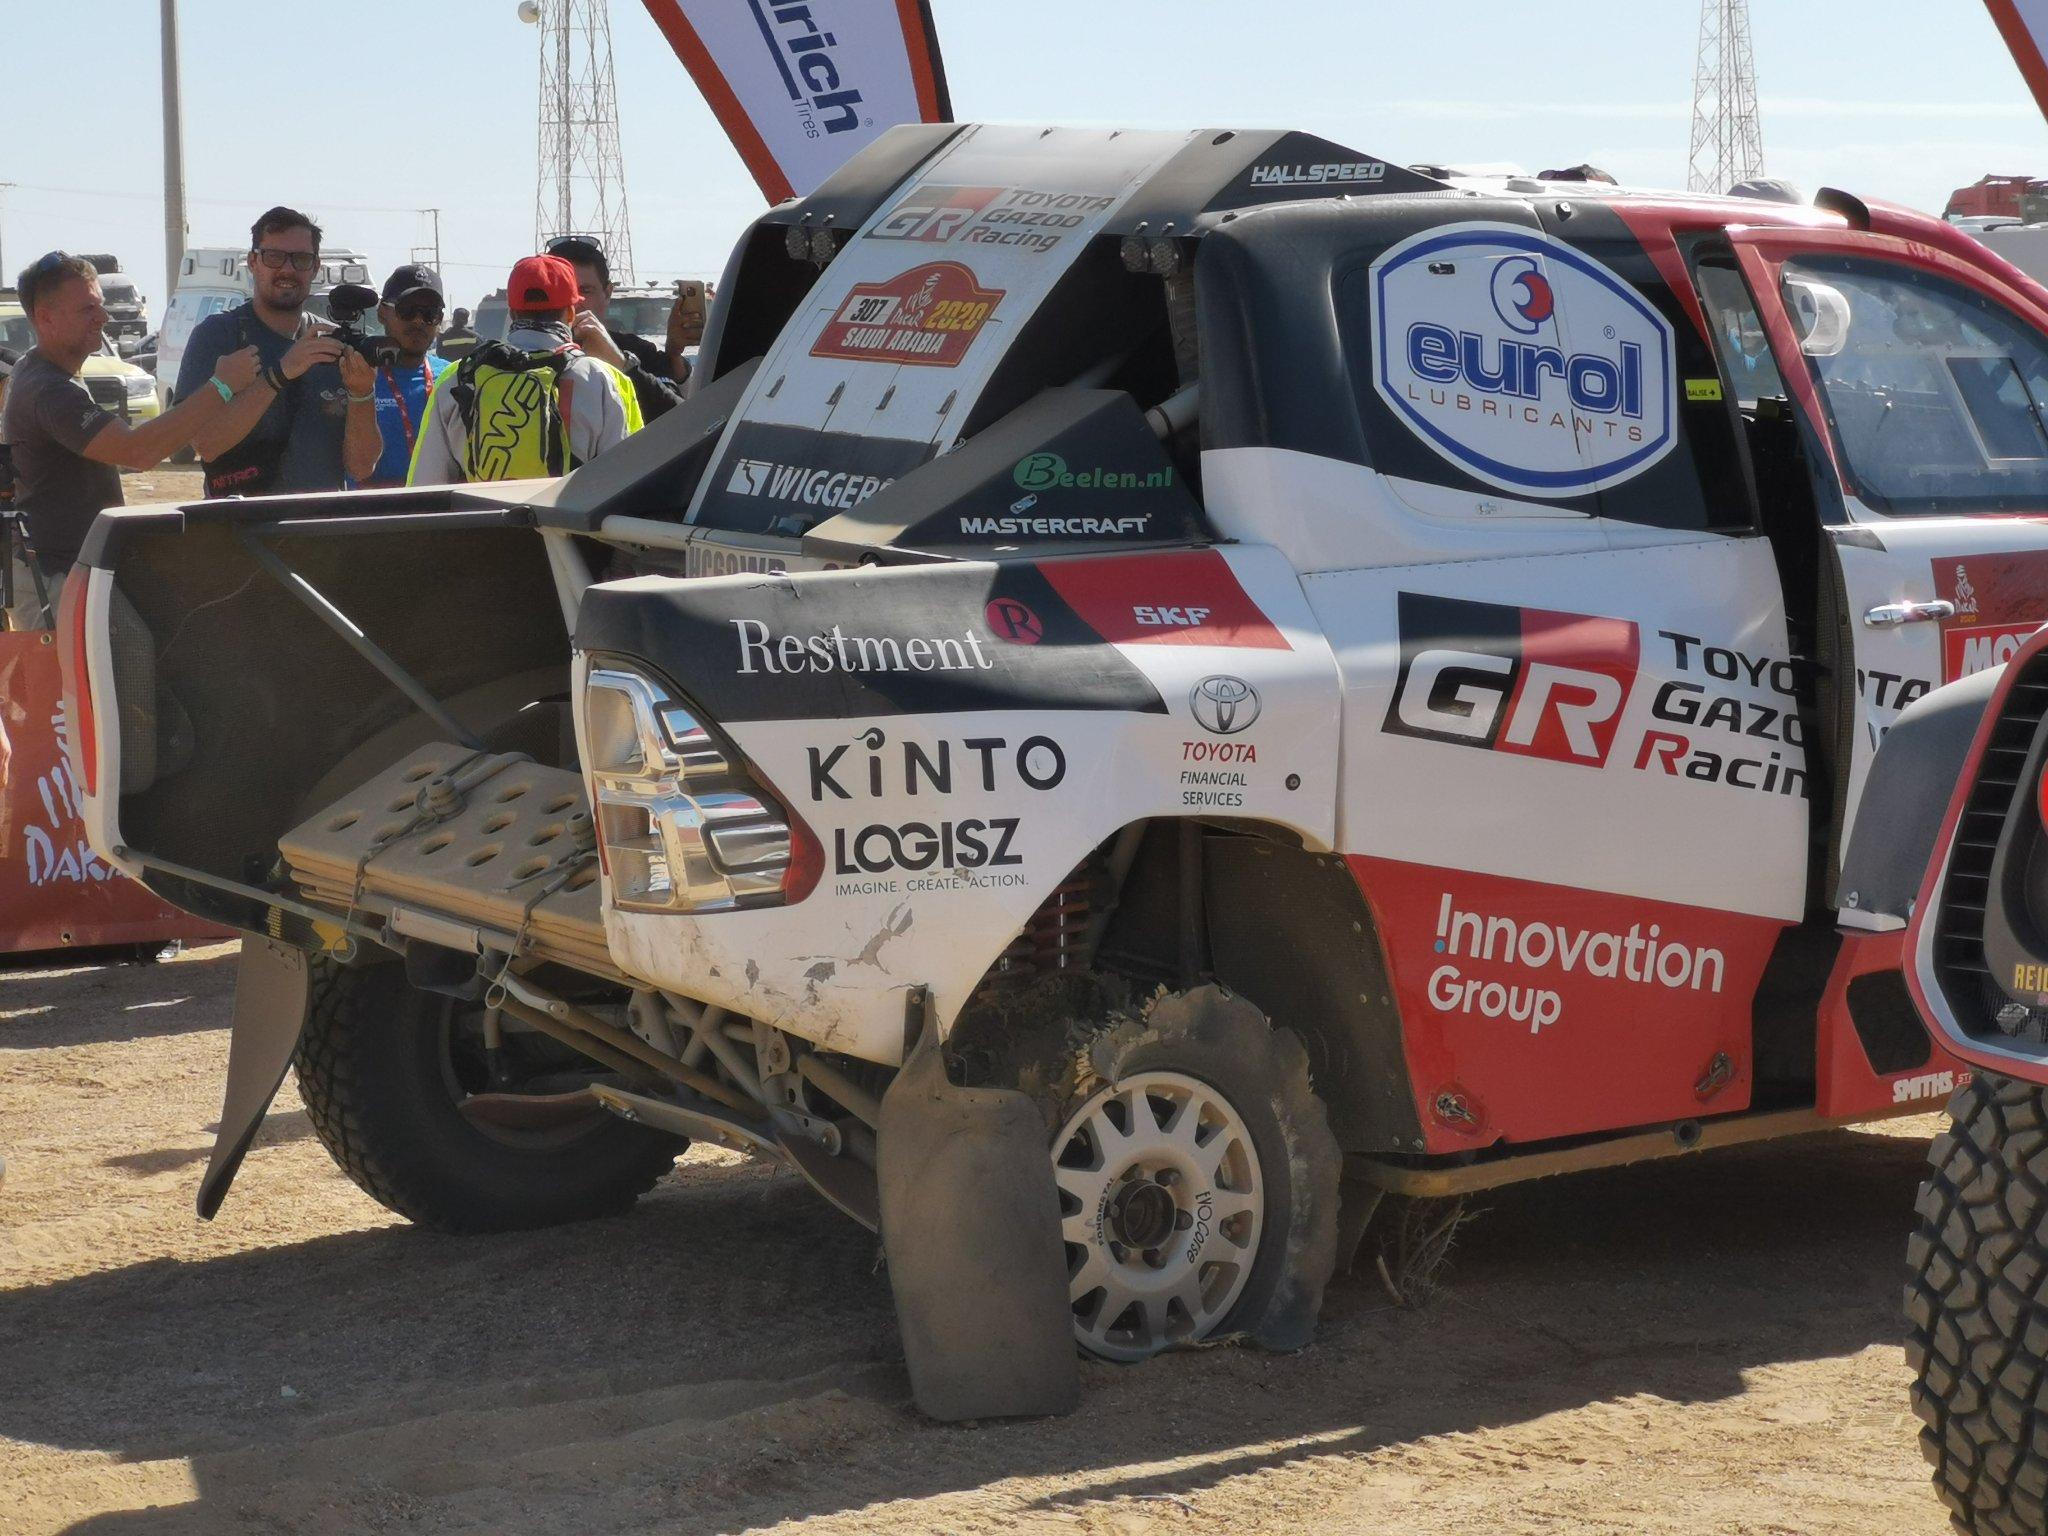 2020 42º Rallye Raid Dakar - Arabia Saudí [5-17 Enero] - Página 3 ENgzEKHXsAAspVG?format=jpg&name=4096x4096